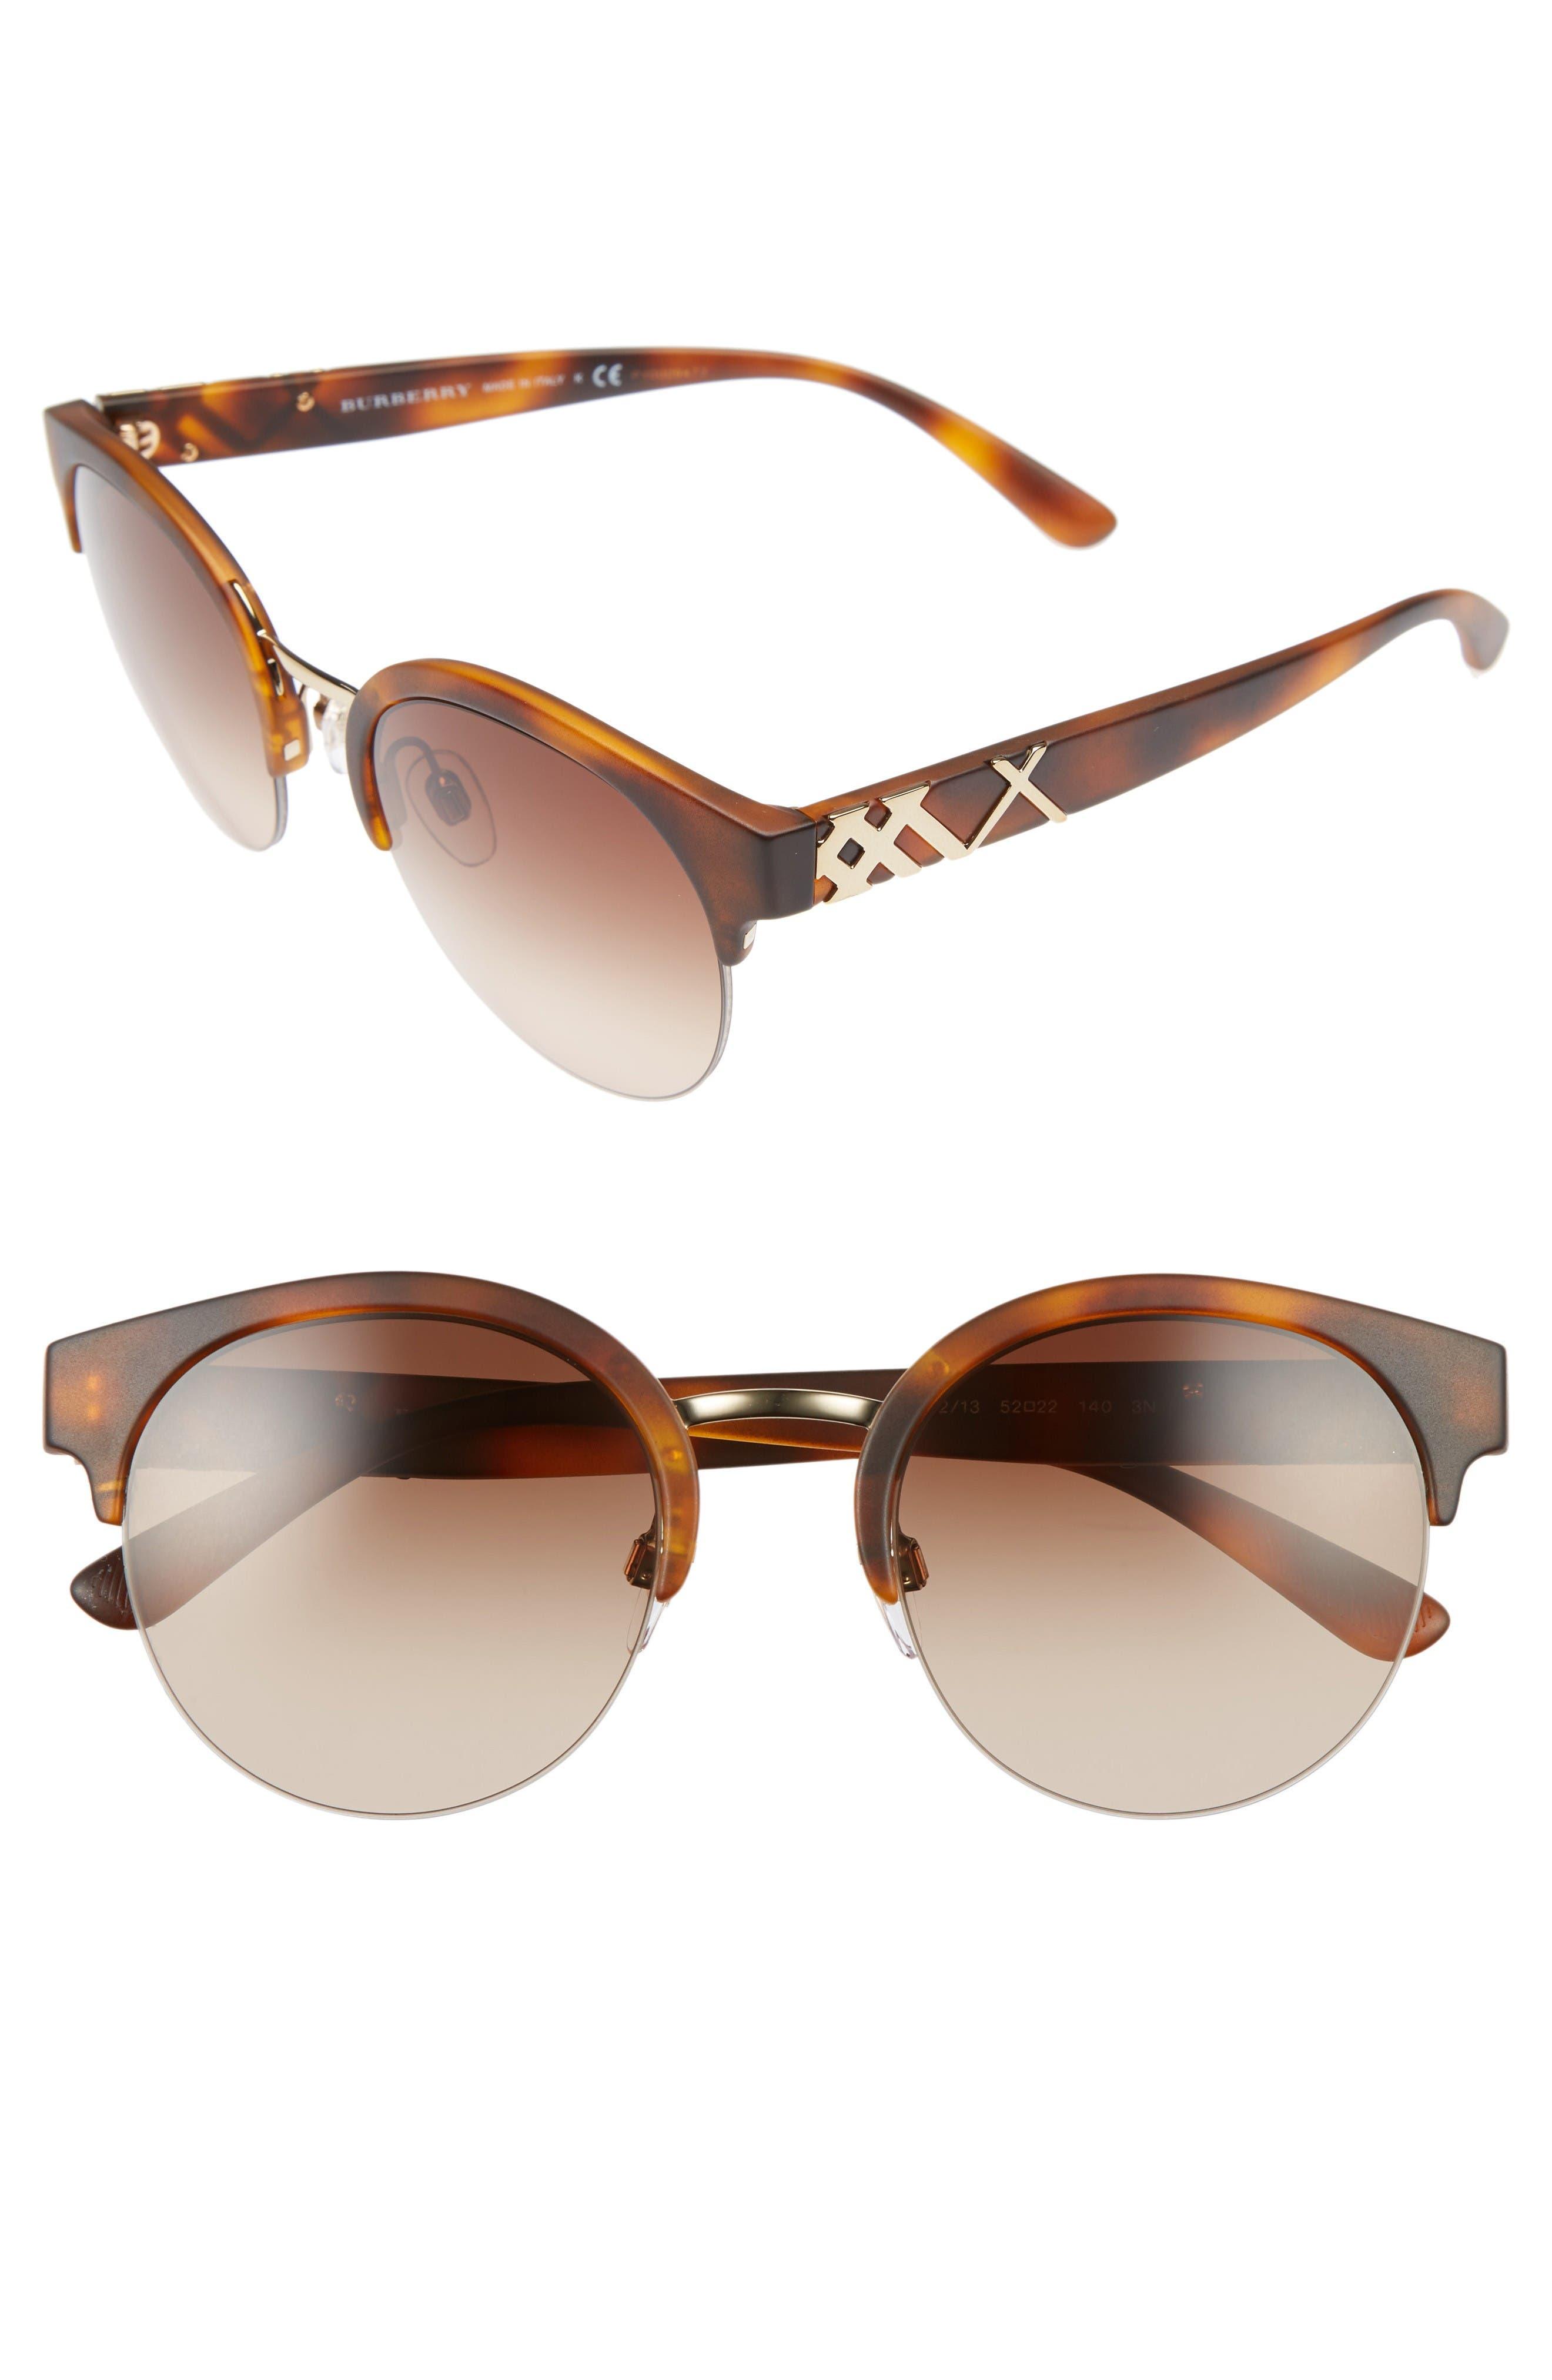 Burberry 52mm Gradient Semi Rimless Sunglasses